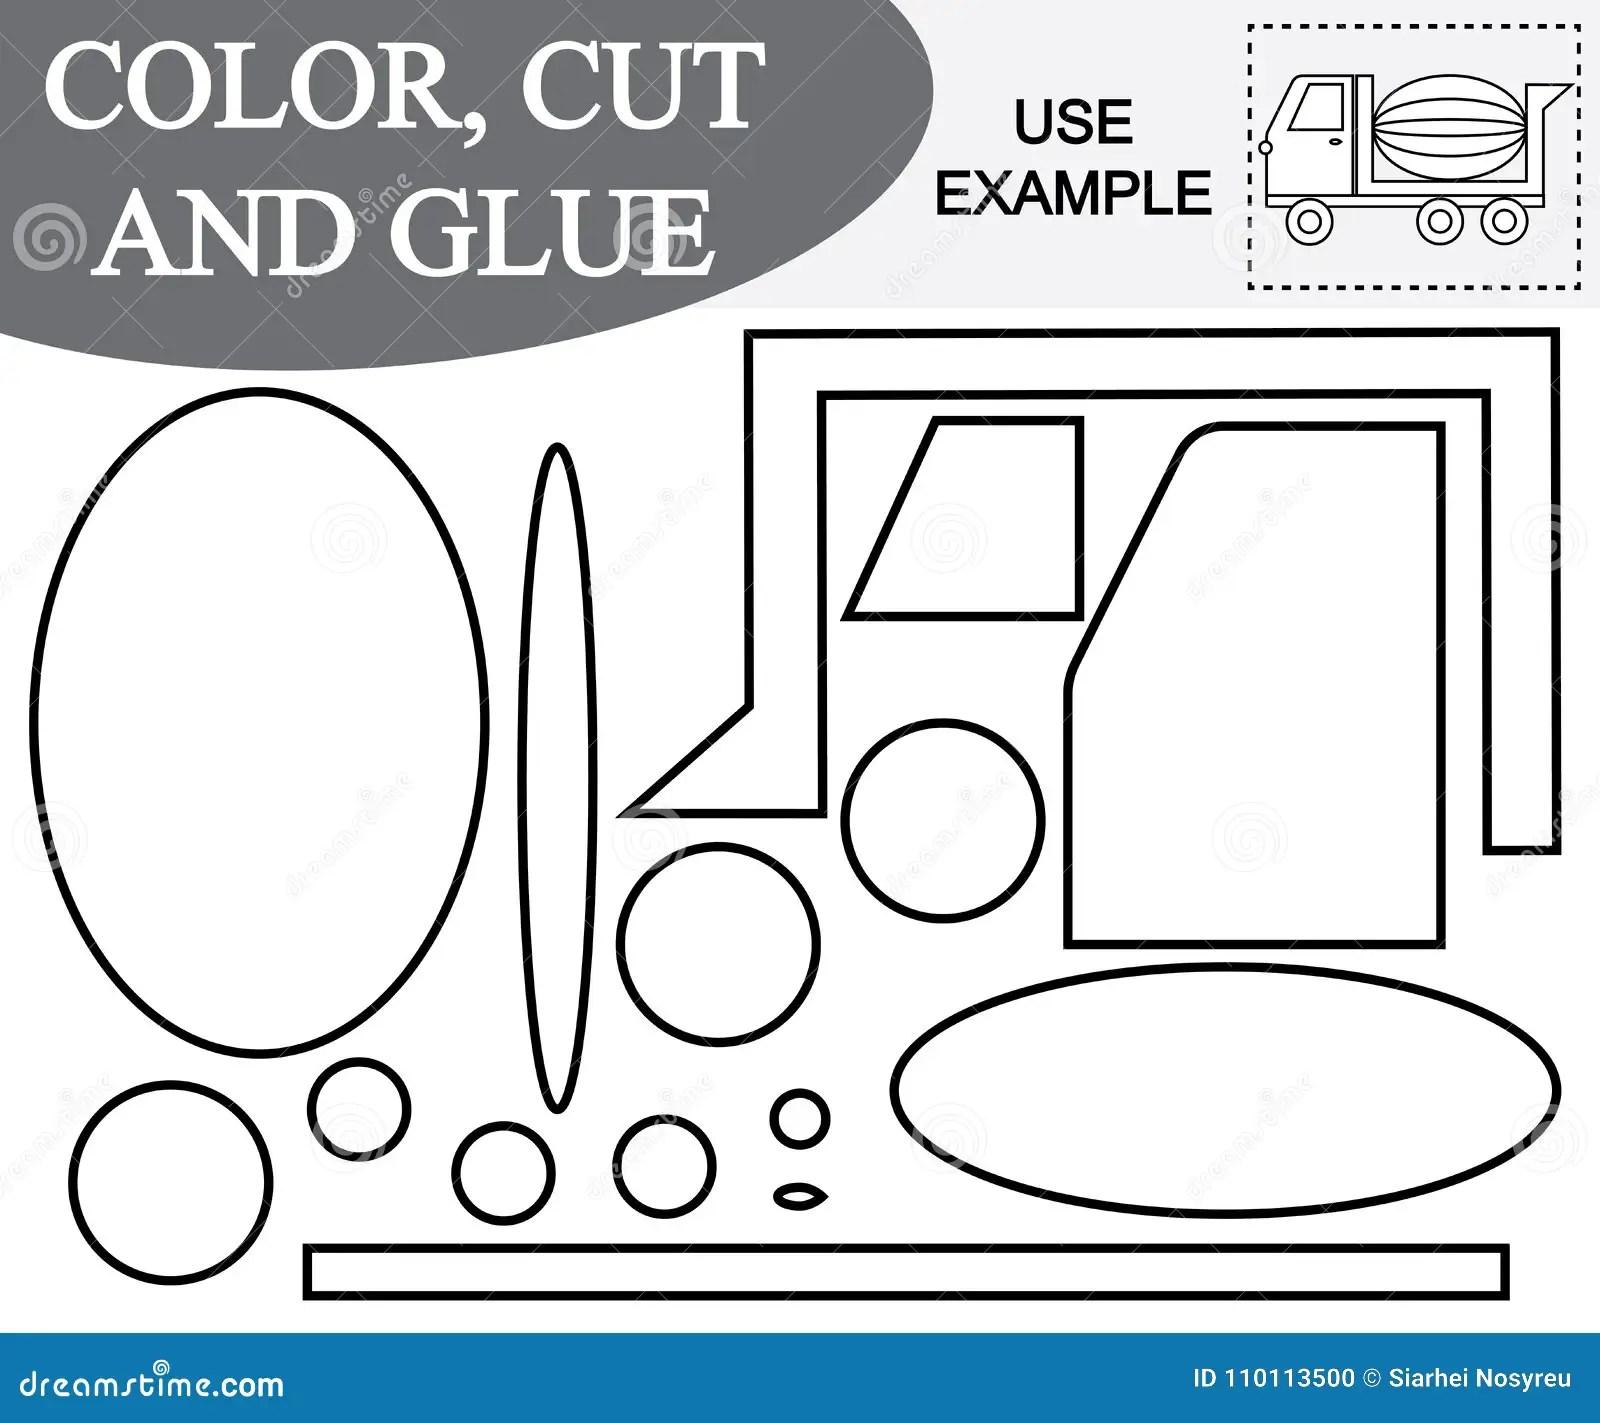 Color Cut And Glue Concrete Mixer Stock Vector